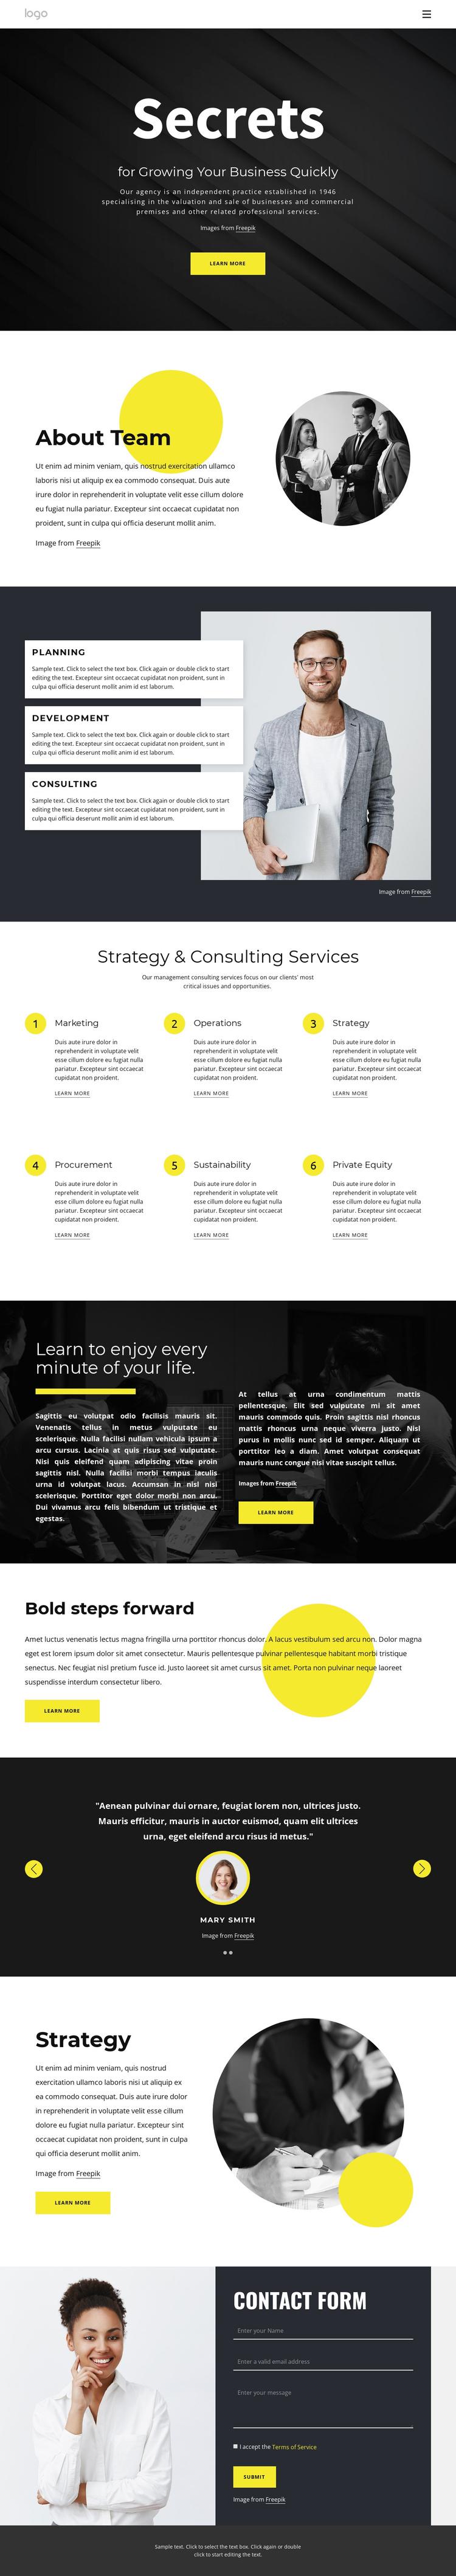 Secrets of growing business Joomla Template